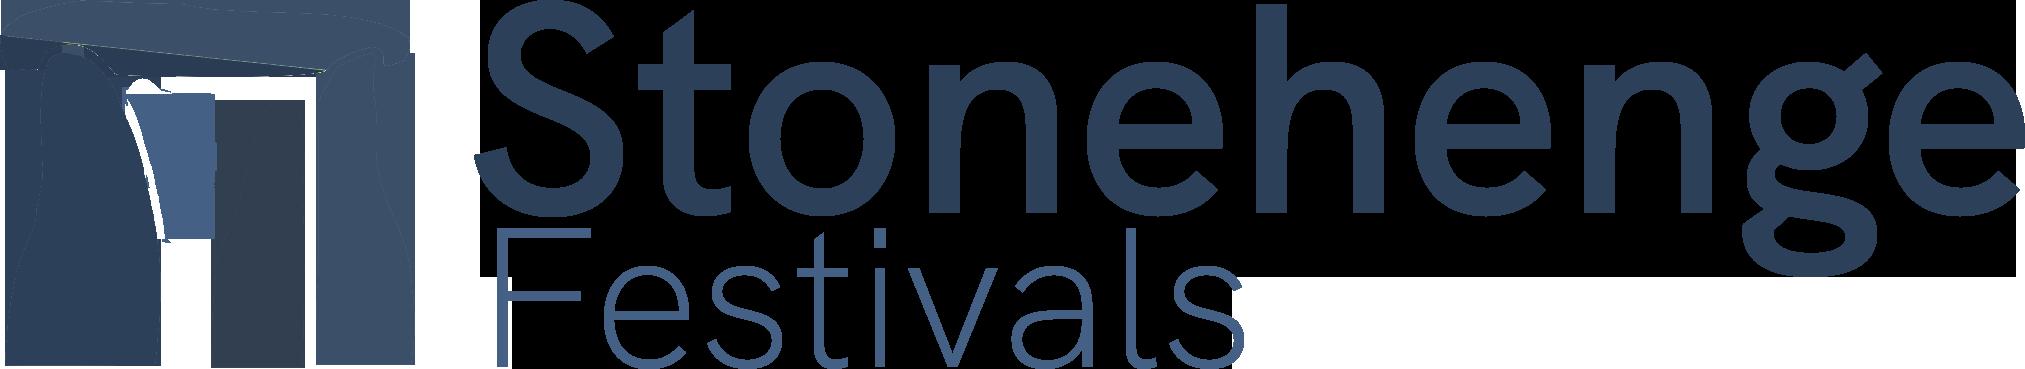 Stonehenge Festivals